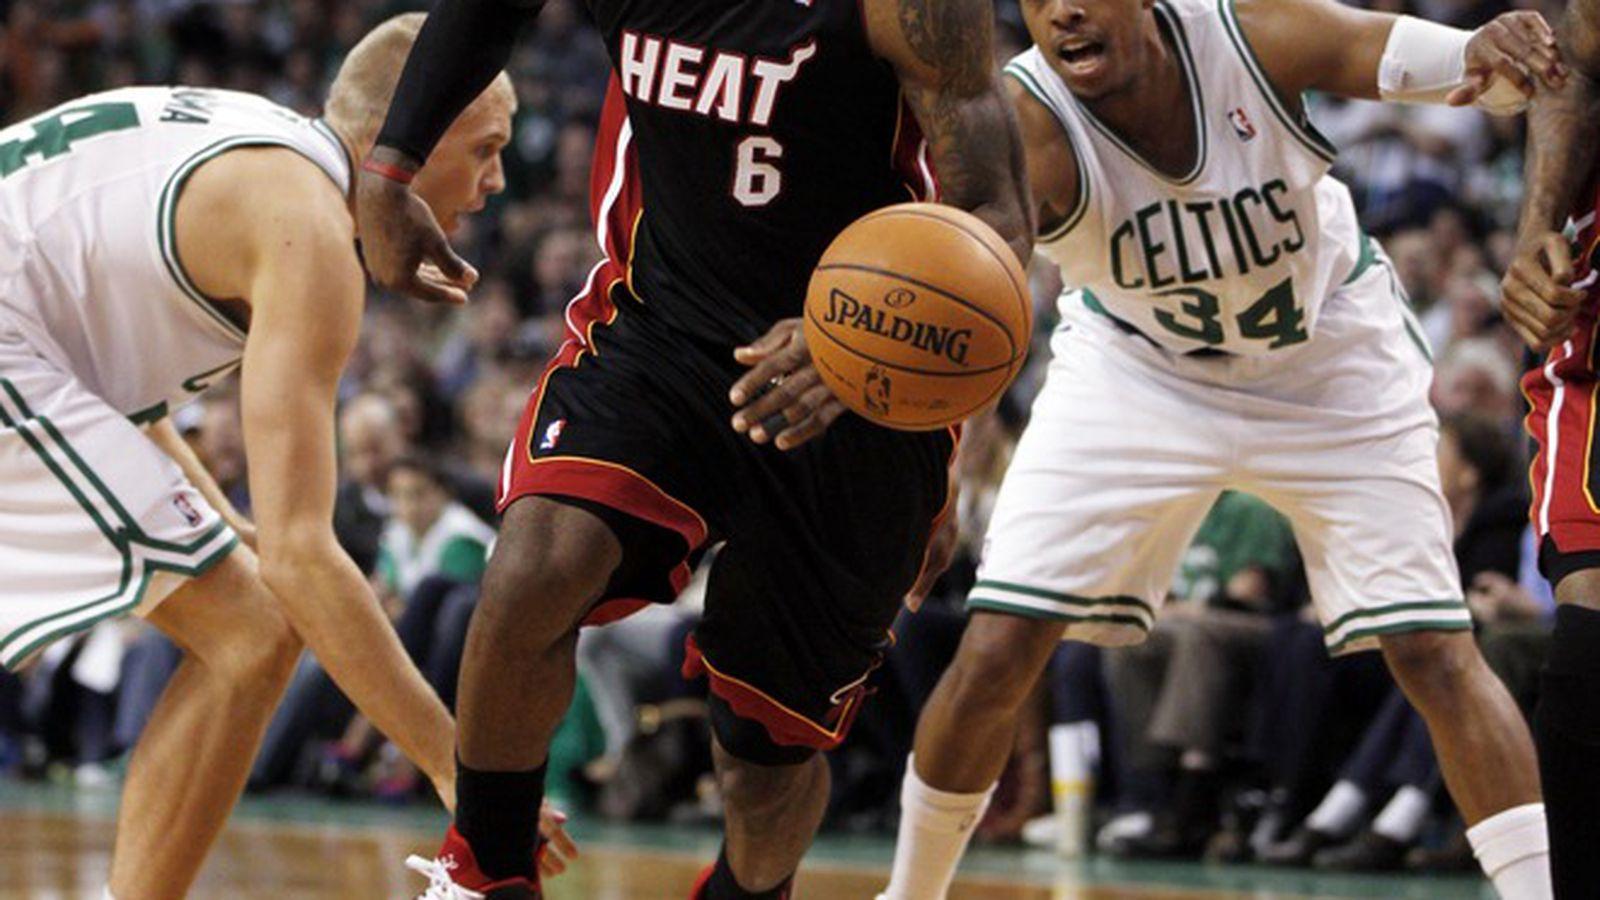 2012 NBA Playoffs, Heat Vs. Celtics: Game Six Time, TV